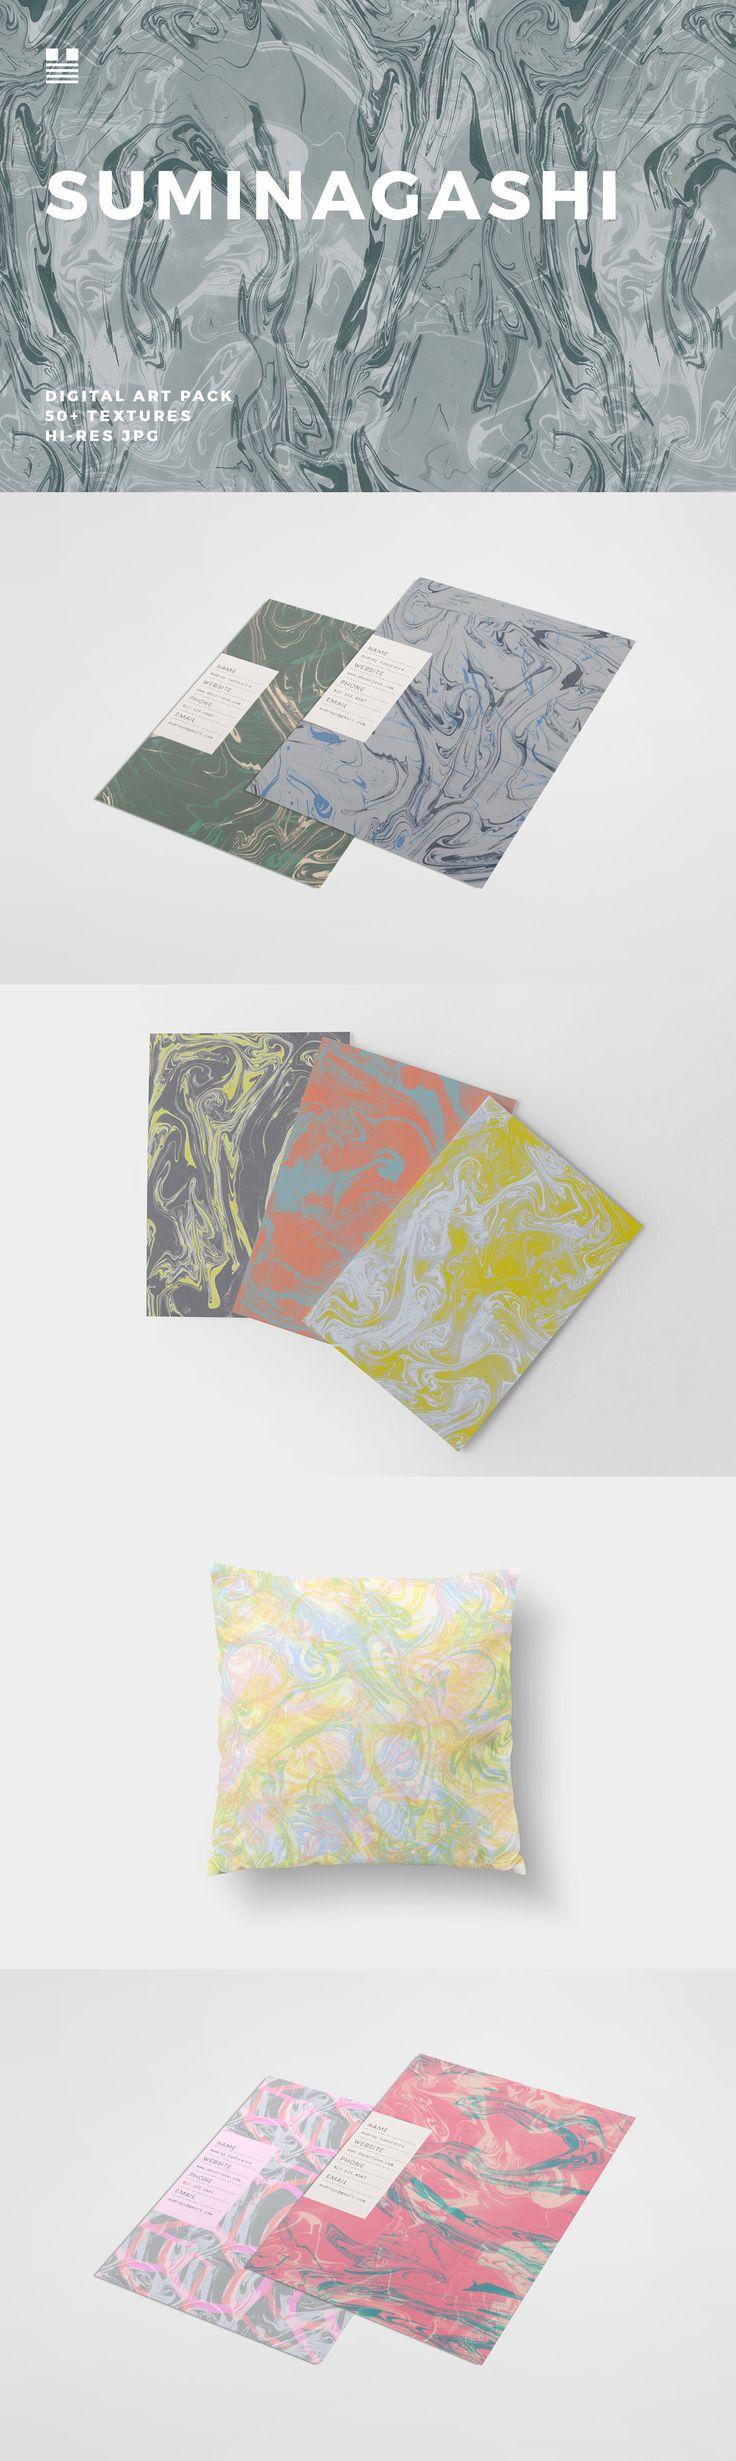 Suminagashi - A seamless texture set made using the Suminagashi marbling method. Neutral, vibrant, pastel a...